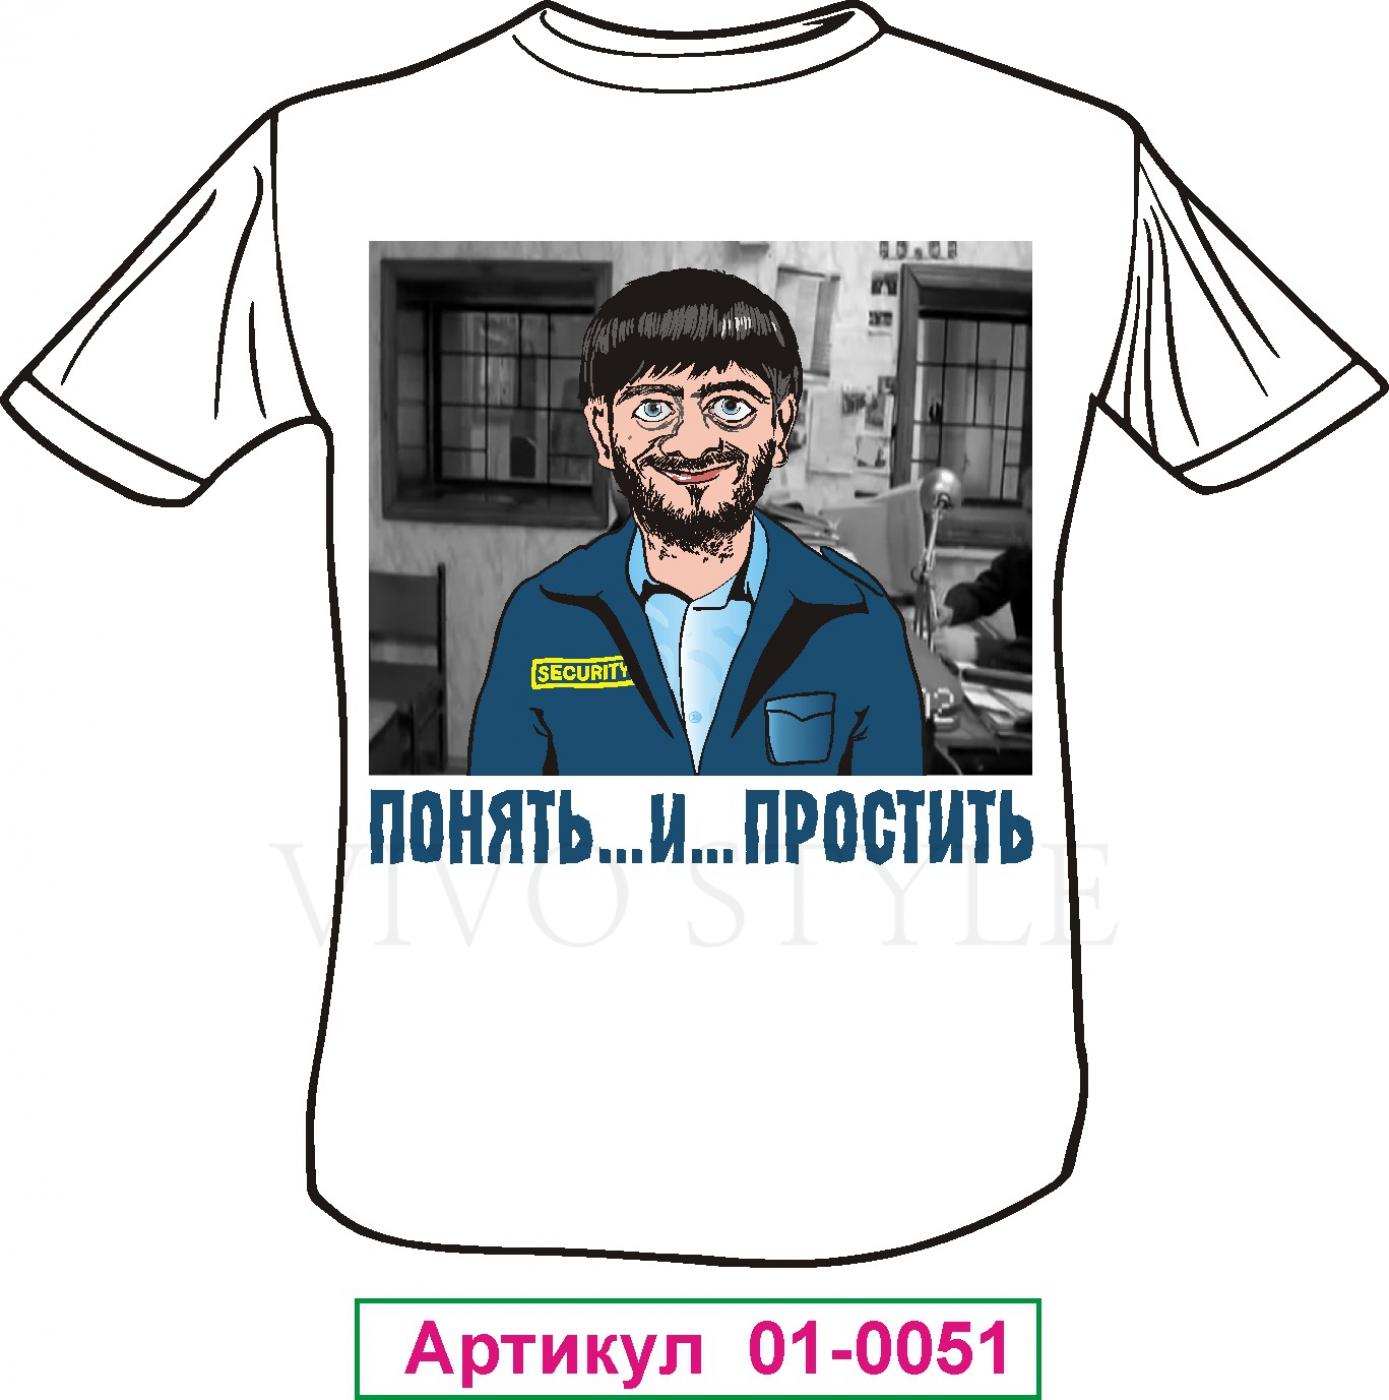 футболка для подарка